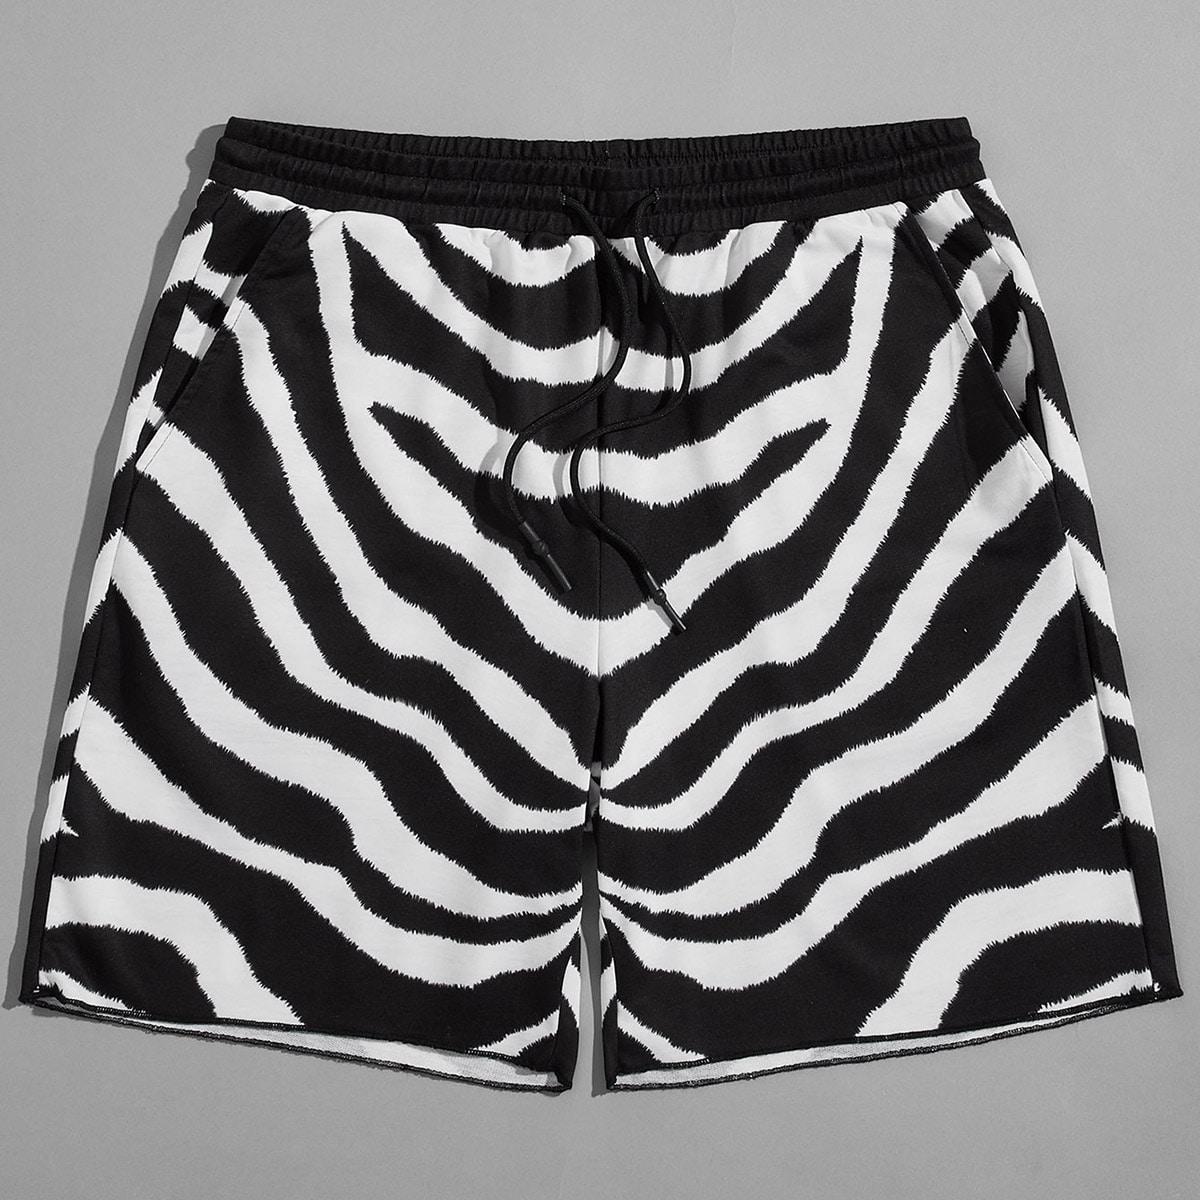 Карман в полоску зебры улица мужские шорты